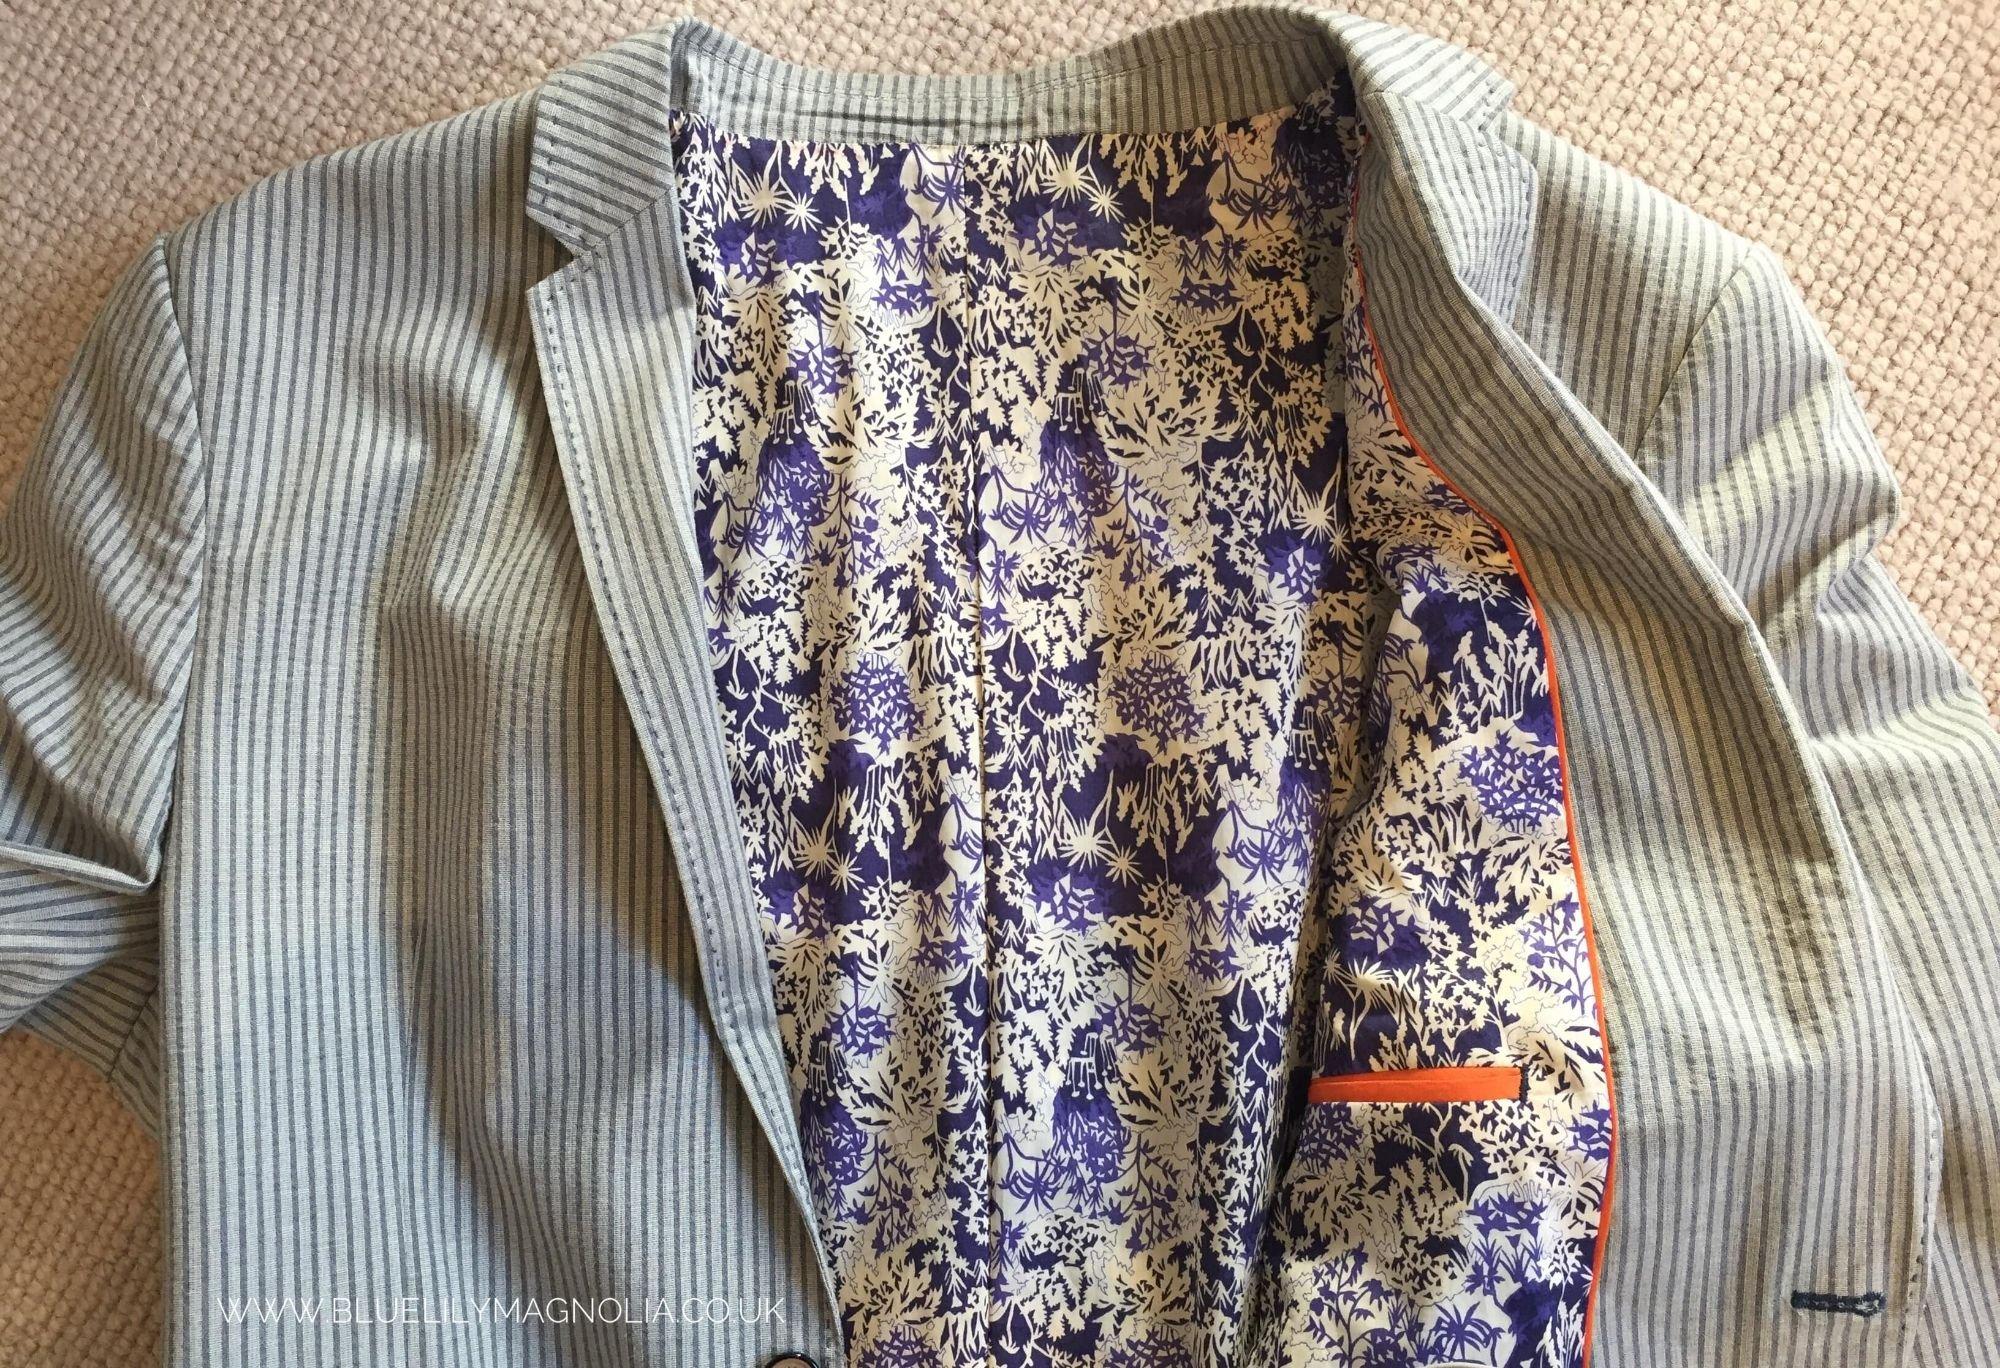 Bespoke jacket lining by Blue Lily Magnolia